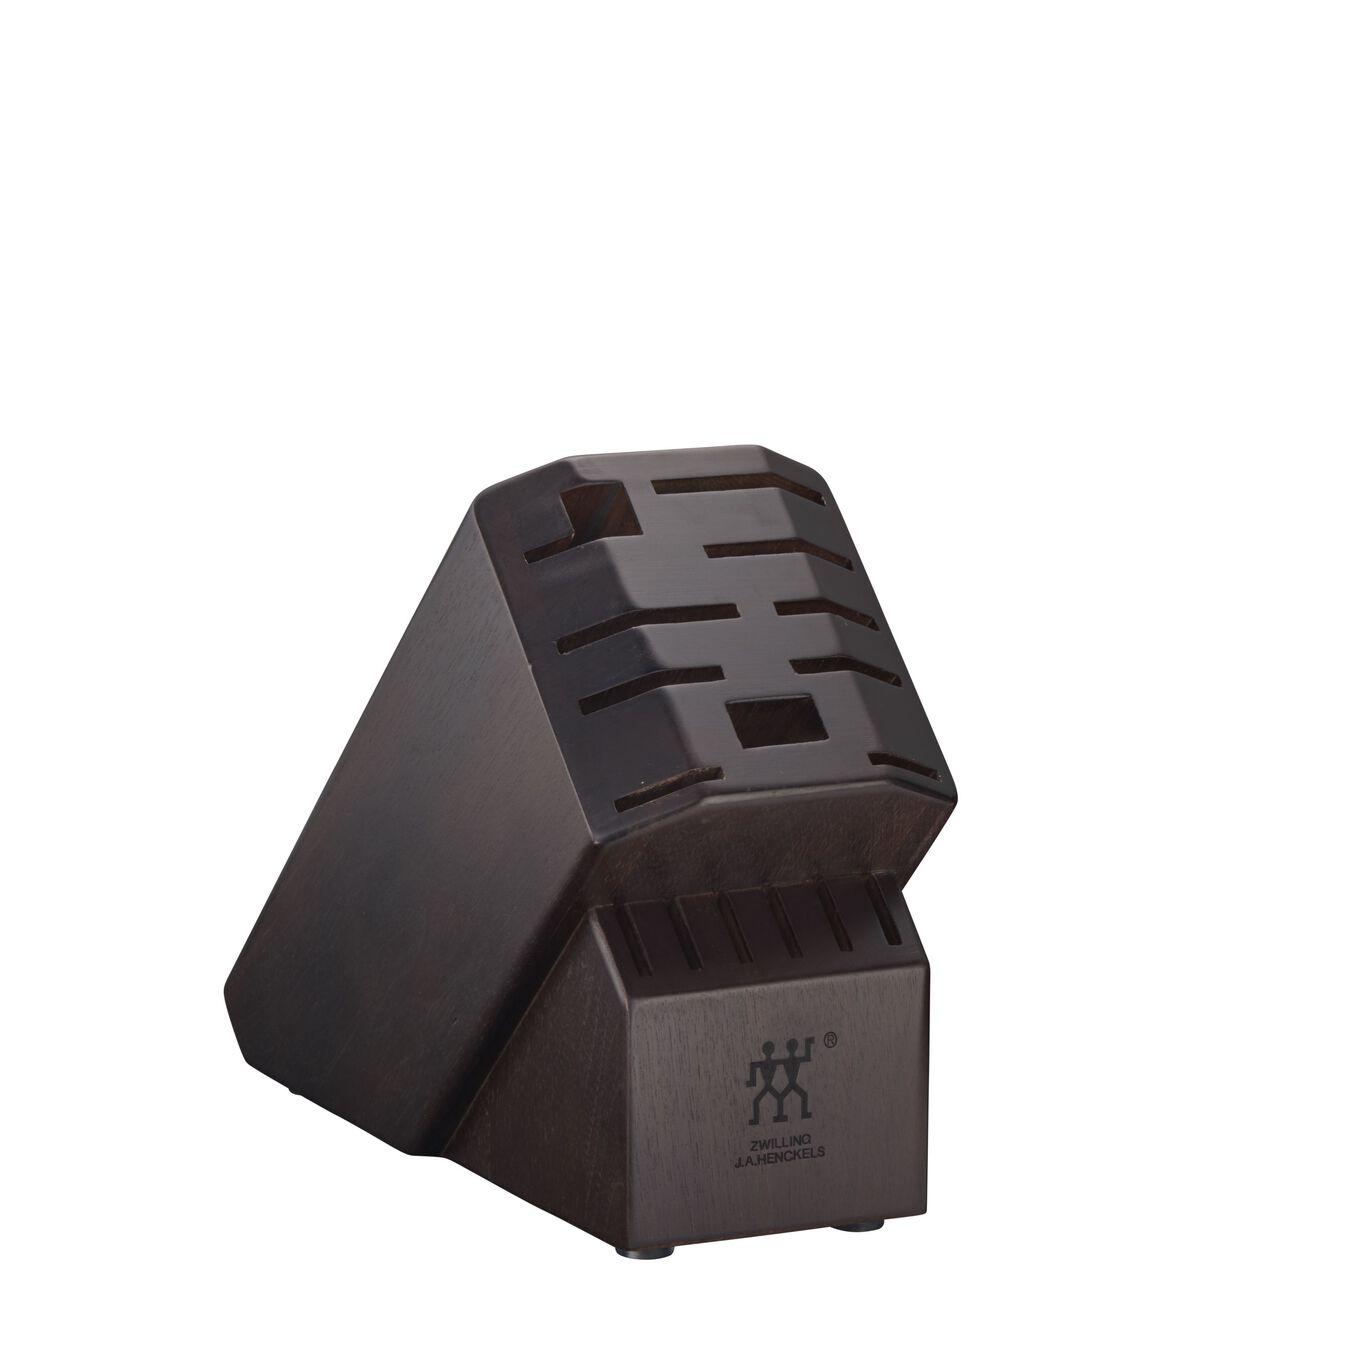 Walnut Dark 16-slot block,,large 1